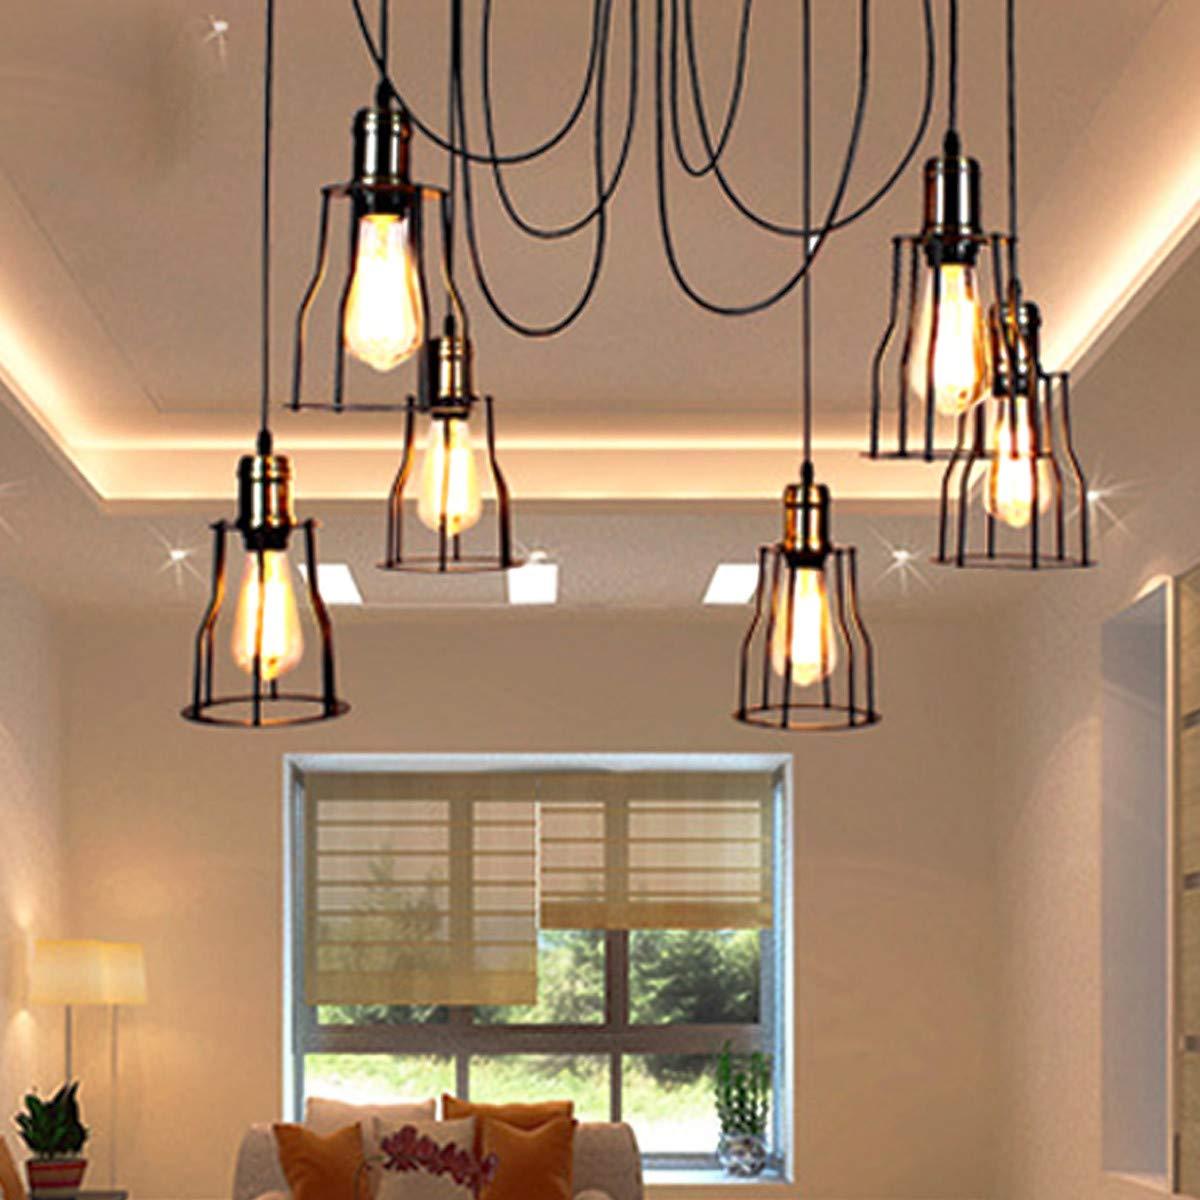 NANGE Vintage Chandelier,Edison Multiple Adjustable DIY Metal Wire Cage Pendant Lighting,Modern Chic Industrial Dining Light,E27(Without Light Source) (Color : Warm White, Size : AC 220V) by NANGE (Image #7)